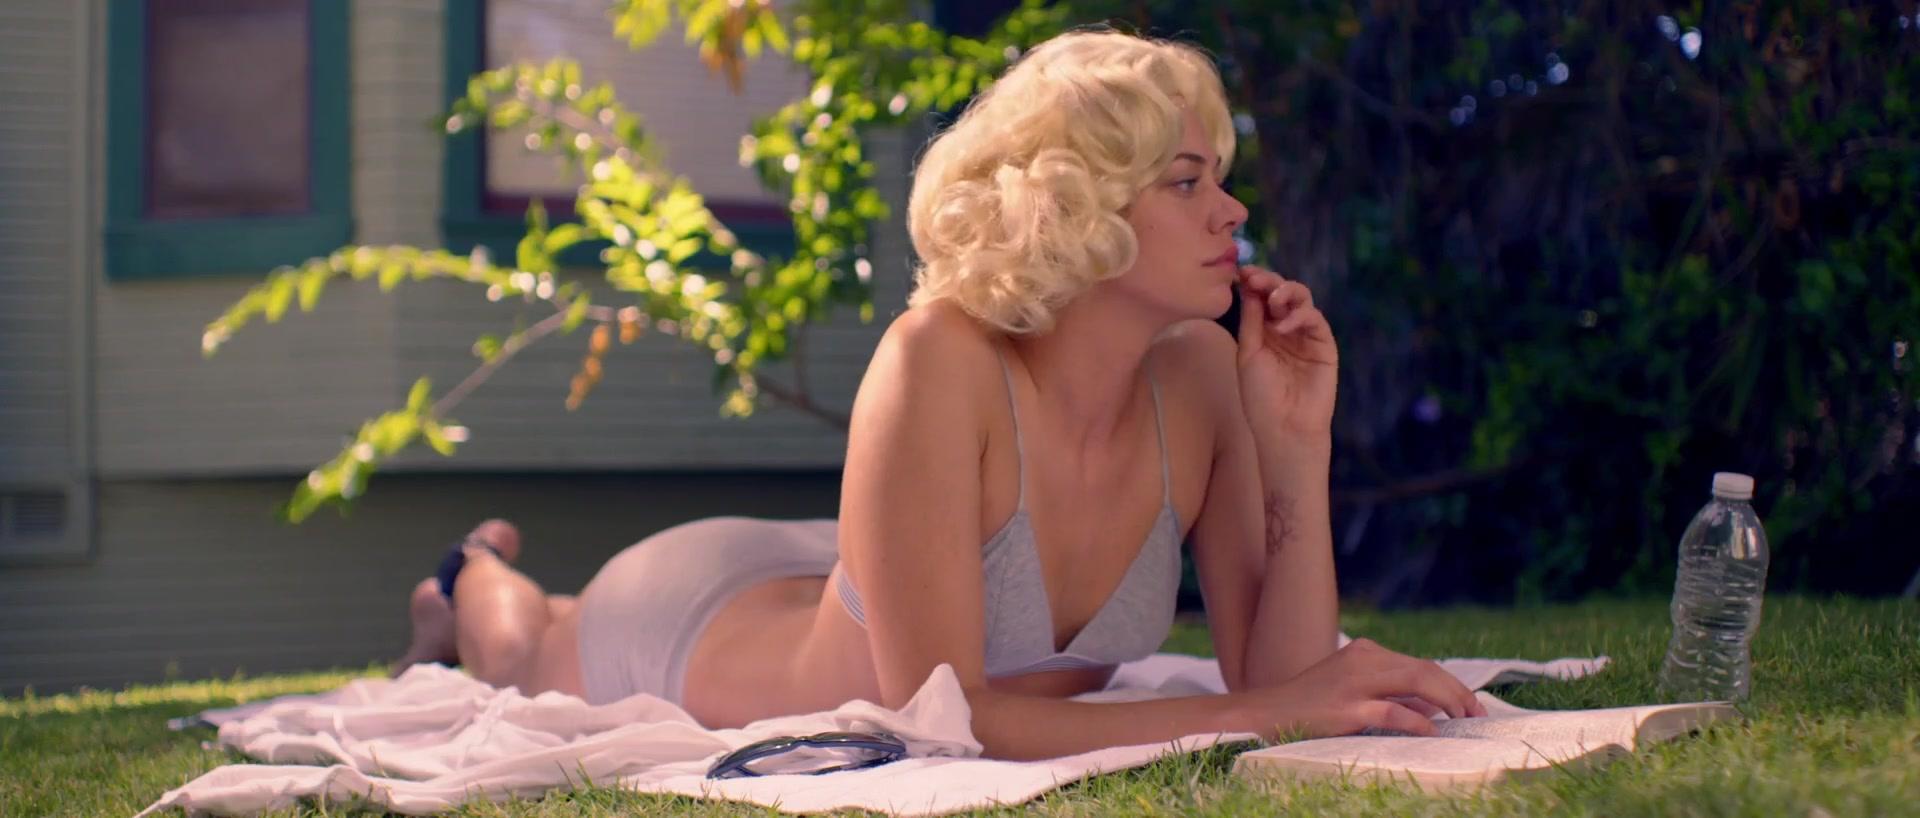 Analeigh Tipton Topless analeigh tipton nude - broken star (2018) video » best sexy